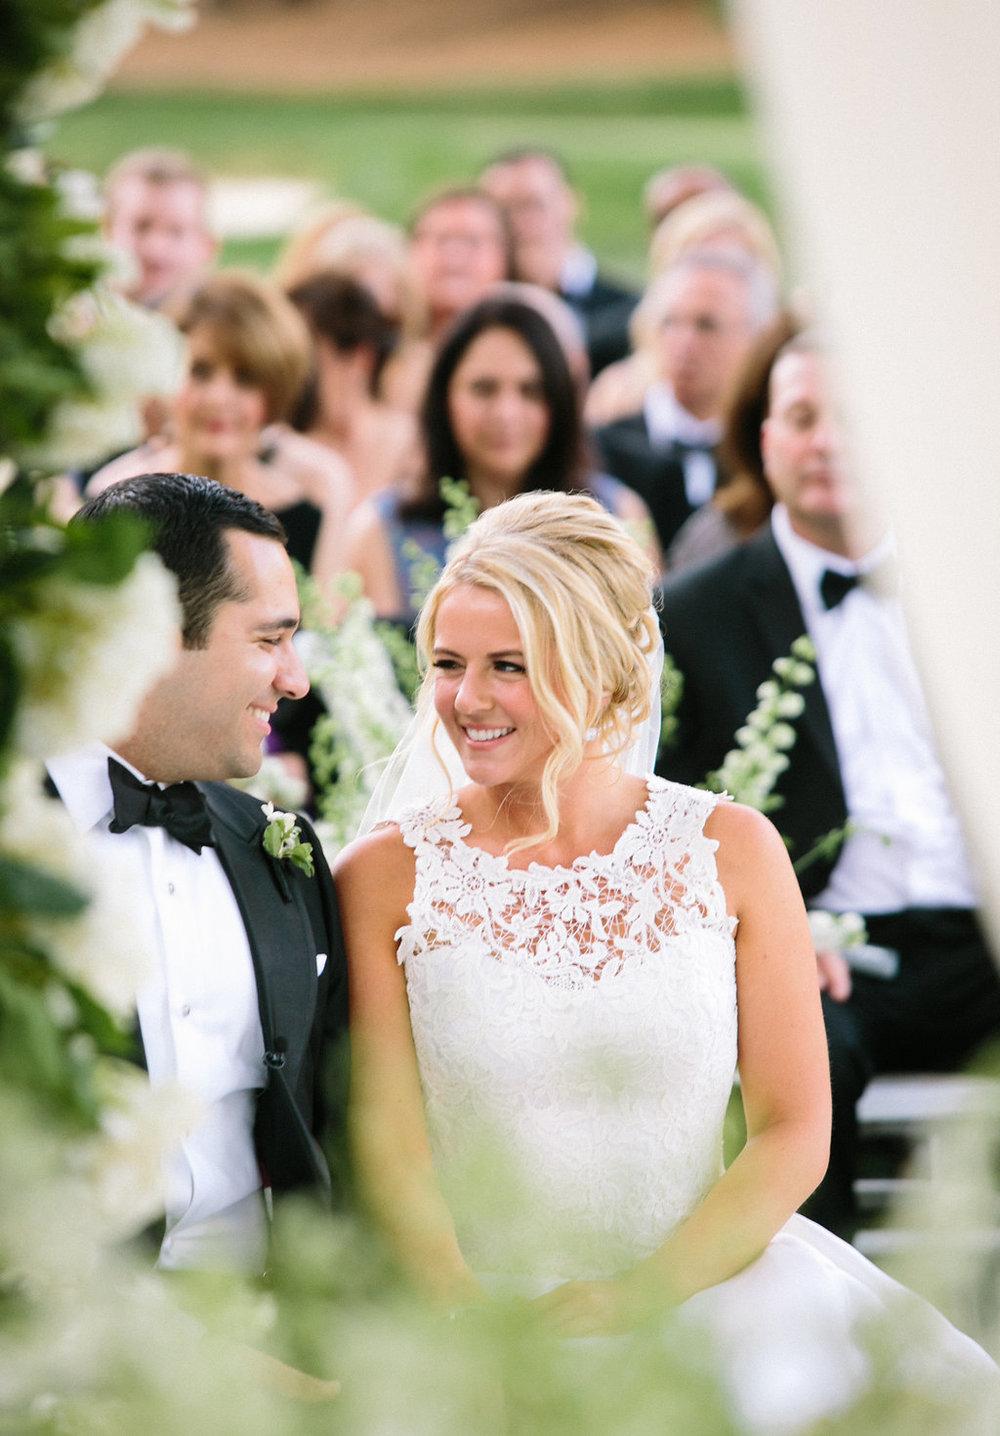 Katlin&Nawder-Ceremony-LindsayMaddenPhotography-72.jpg